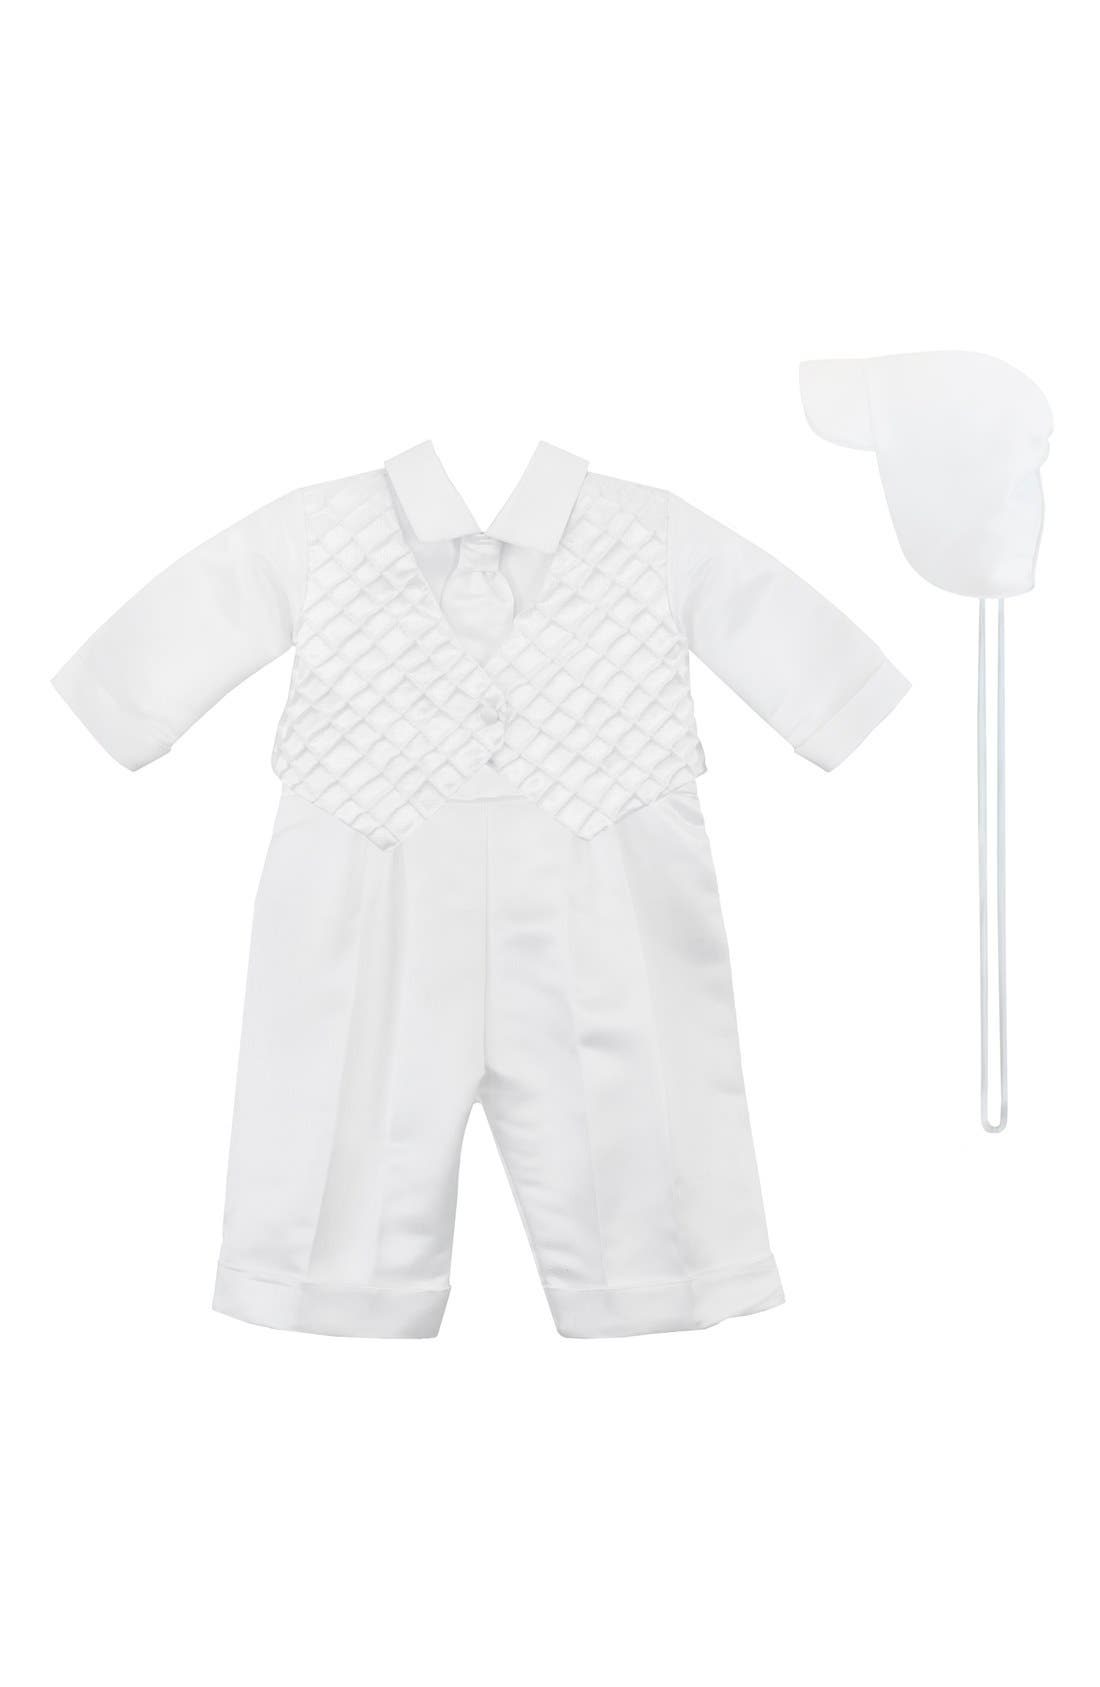 C.I. Castro & Co. Christening Shirt, Pants & Hat (Baby Boys)